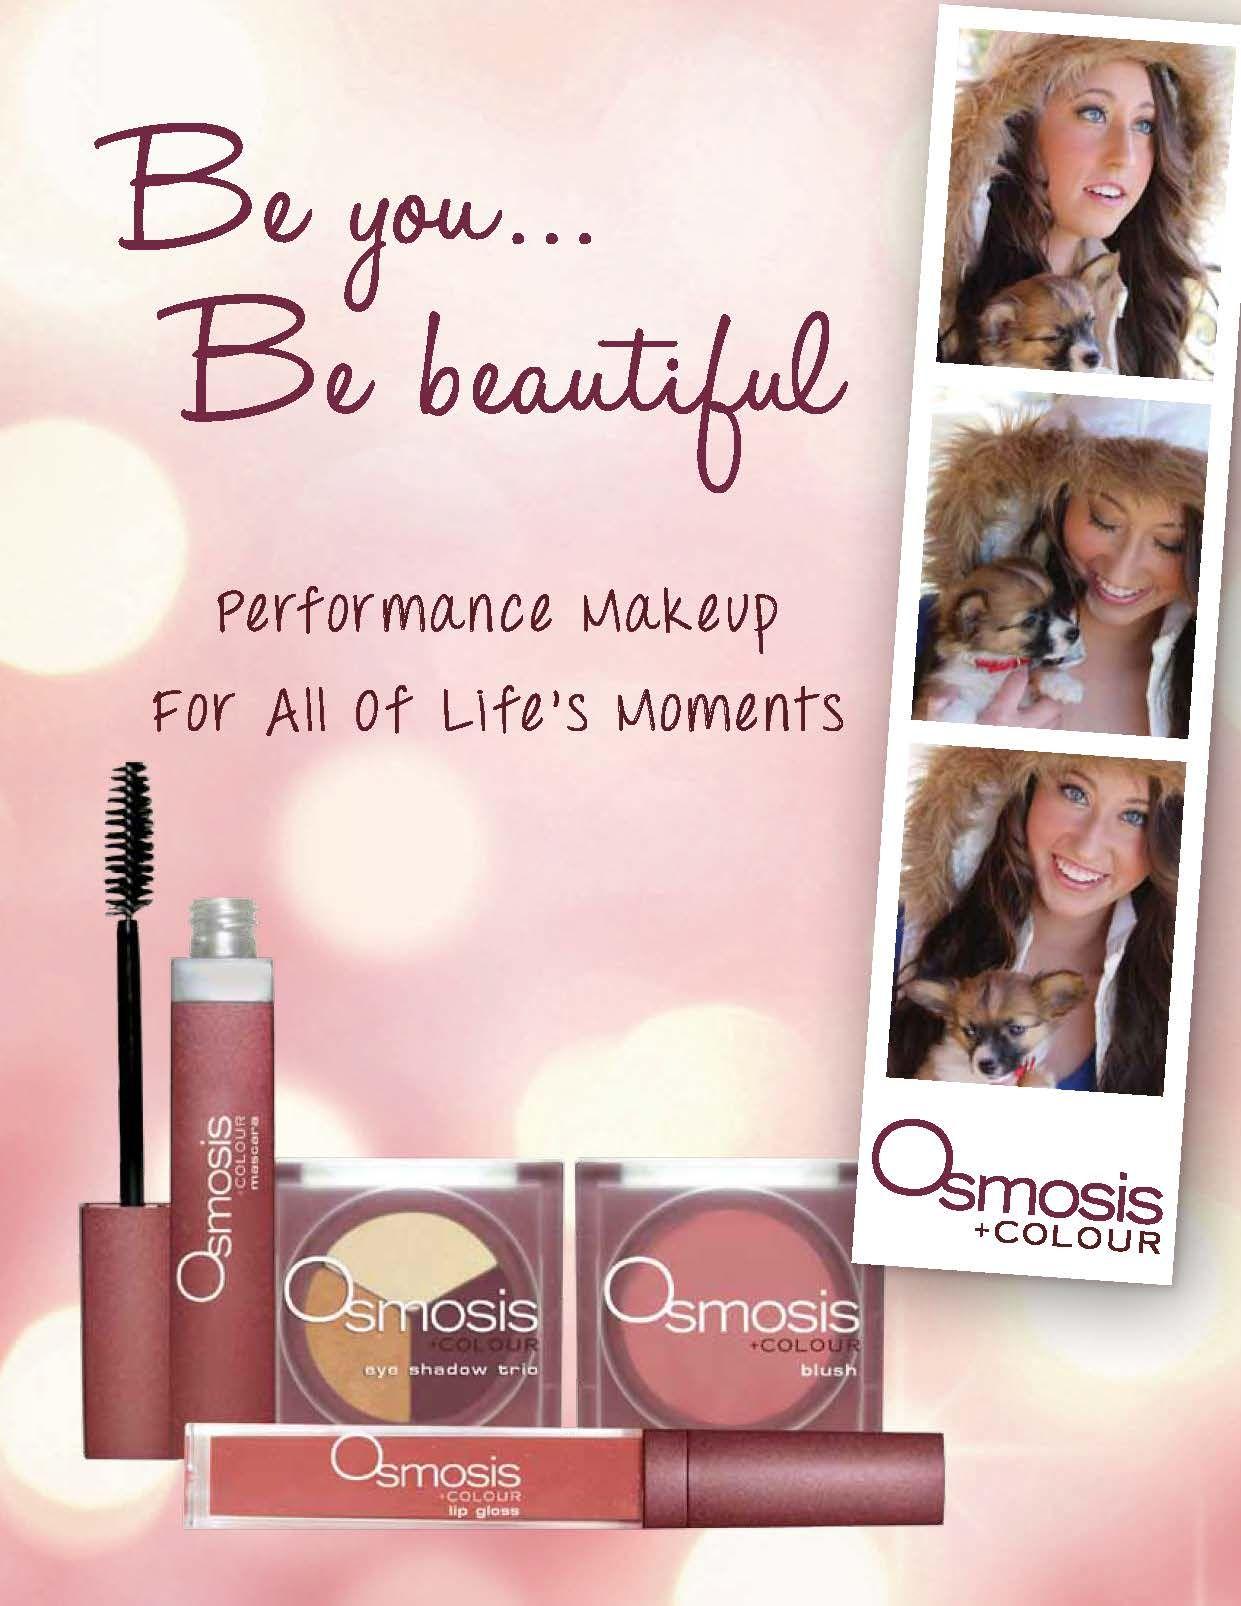 Let Osmosis Colour Makeup Nourish Your